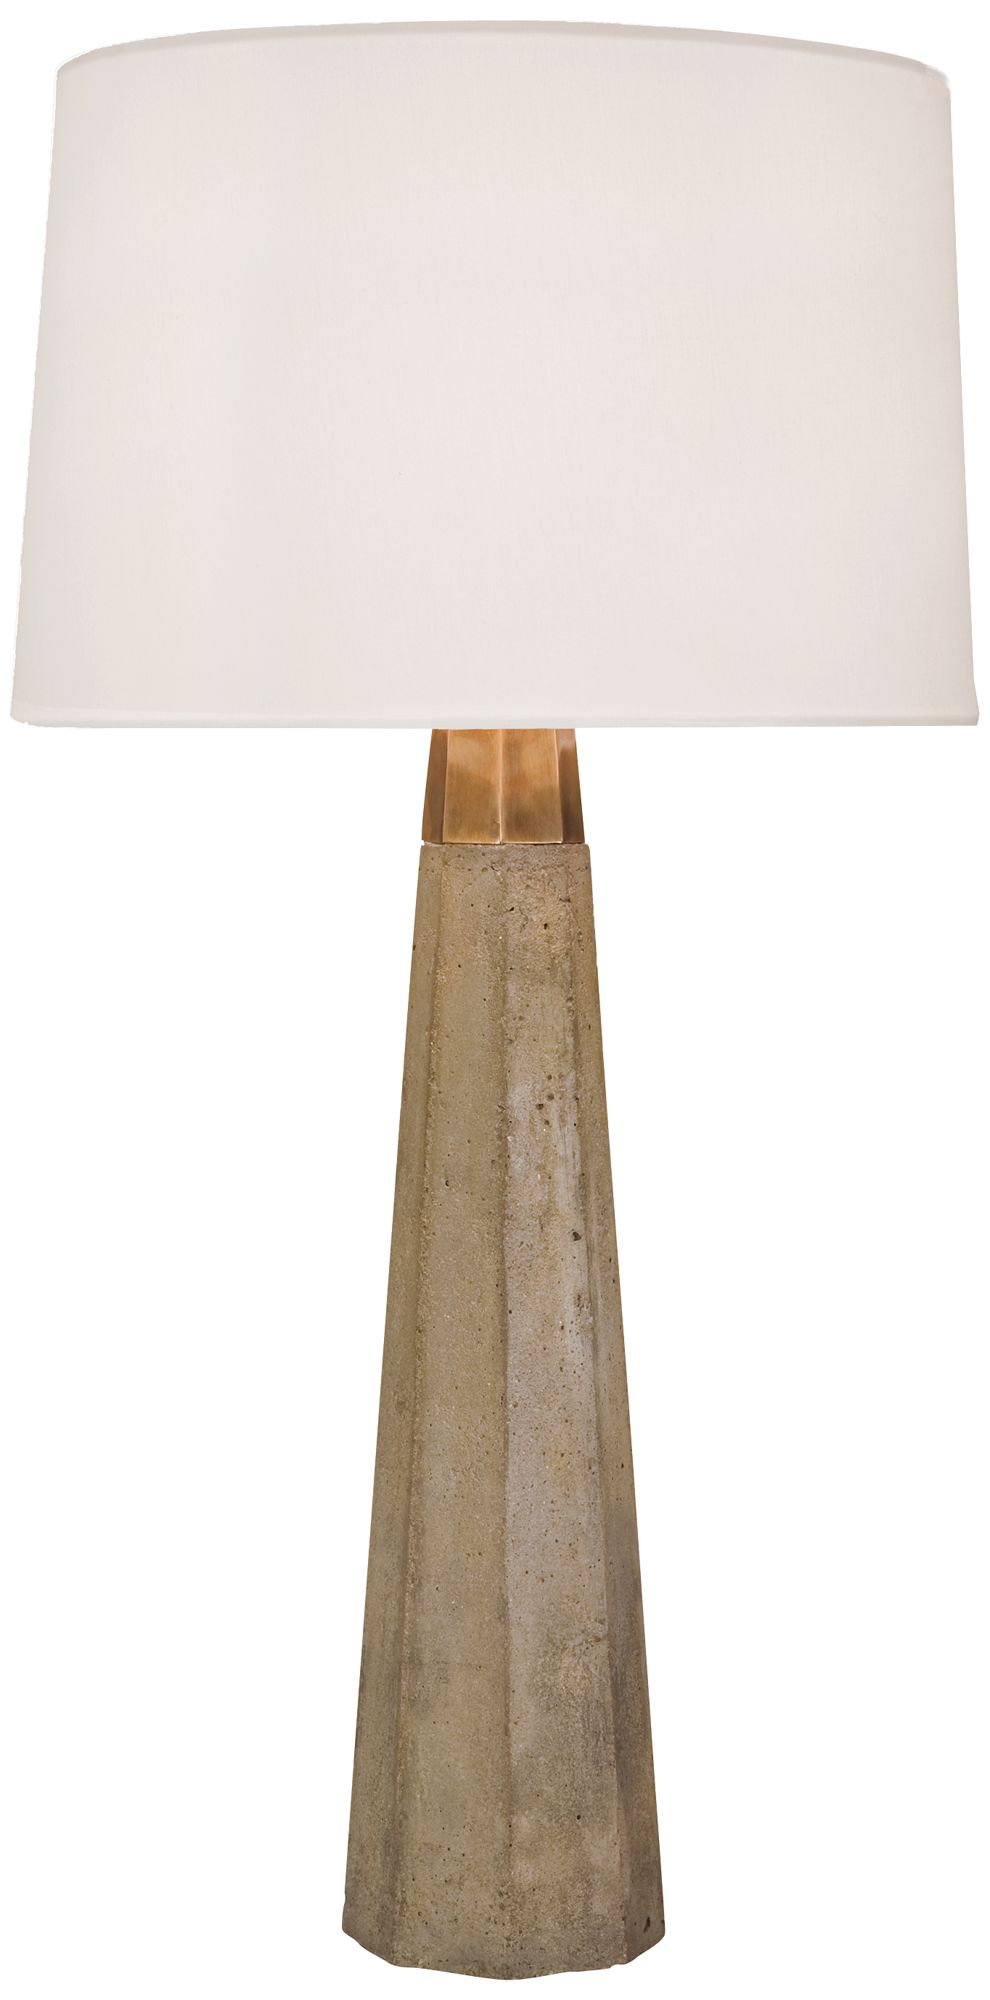 Regina Andrew Design Concrete and Brass Table Lamp 5W909